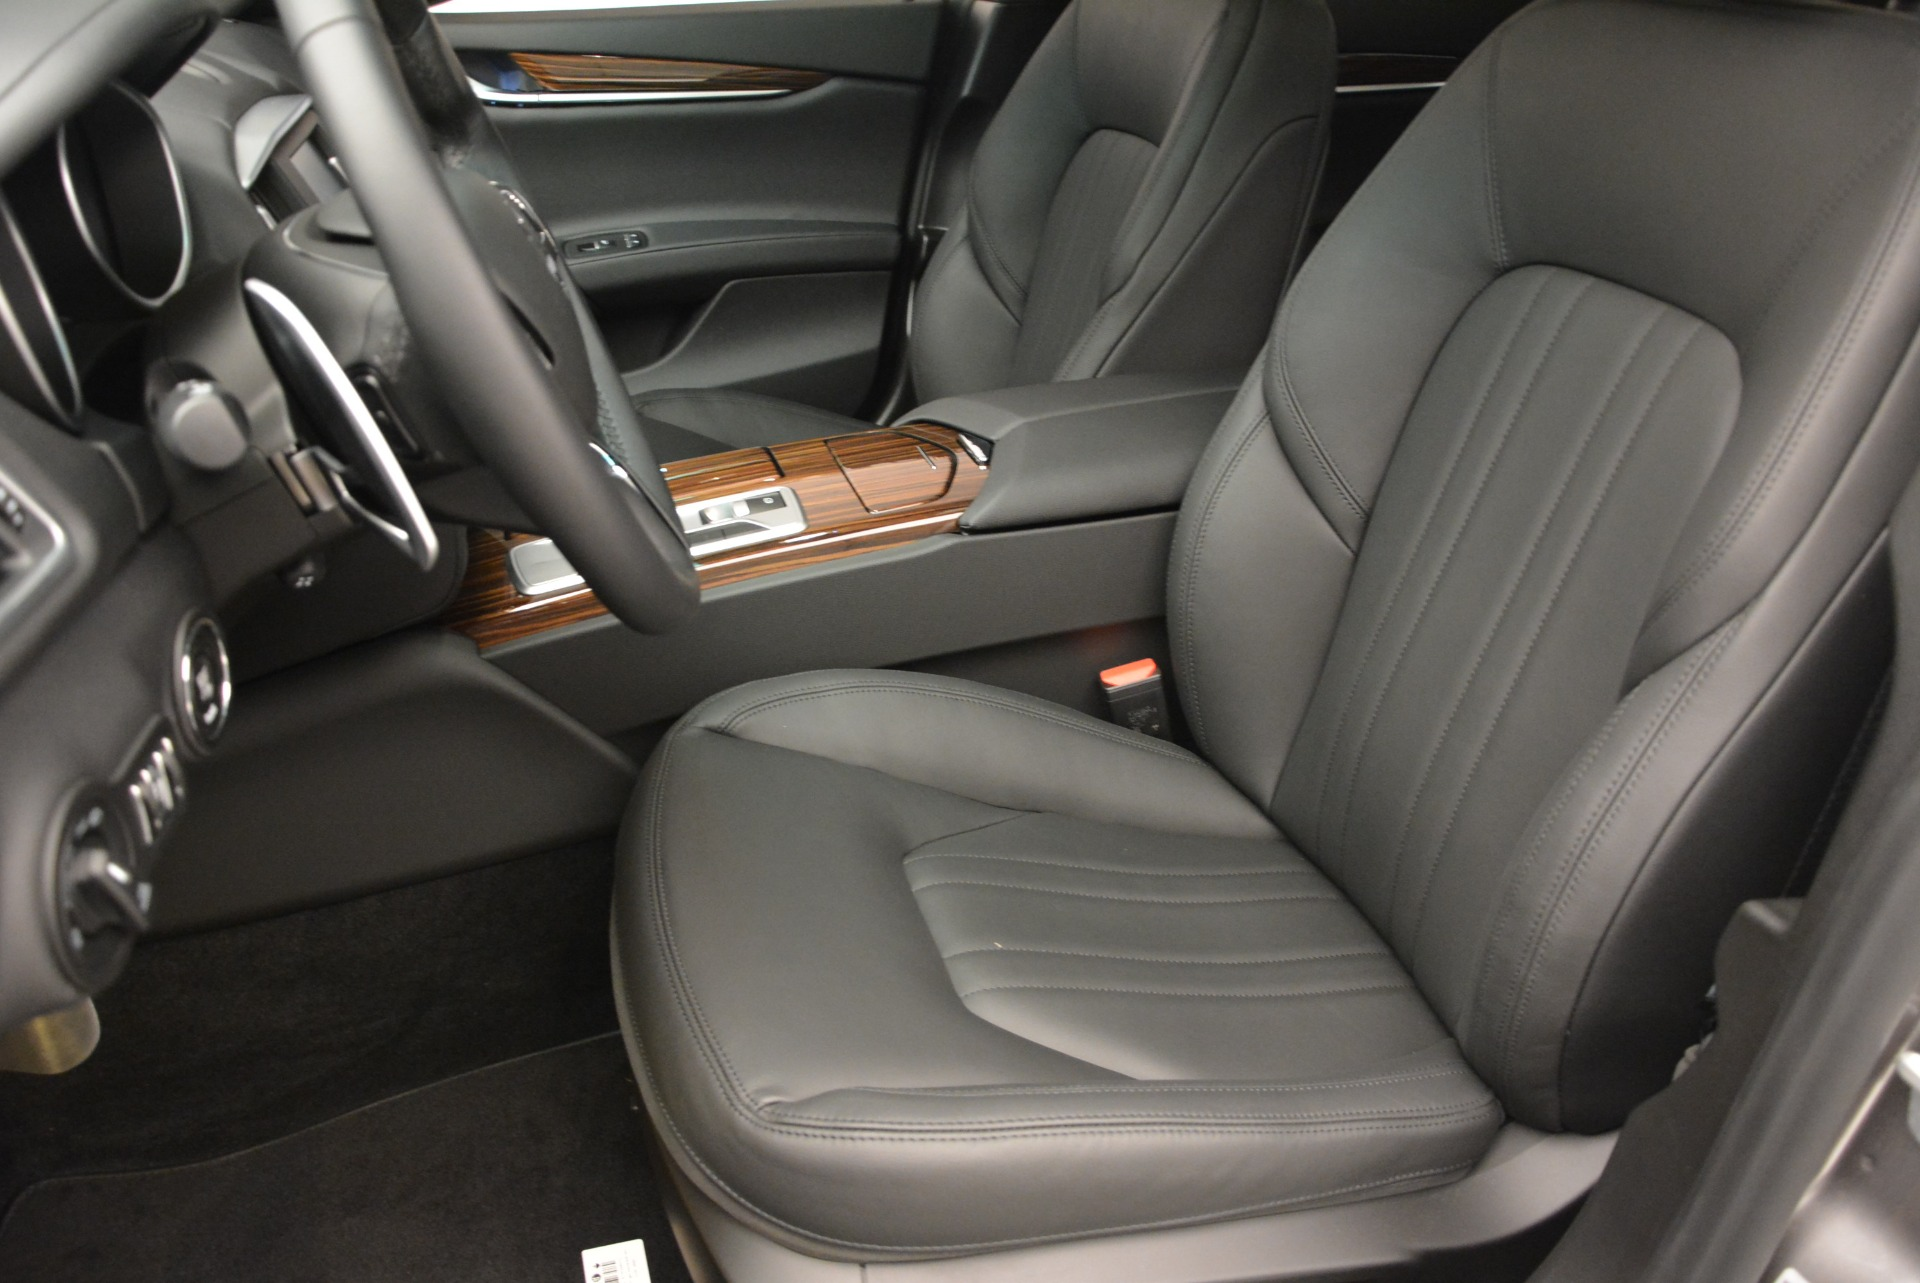 Used 2014 Maserati Ghibli S Q4 For Sale In Greenwich, CT. Alfa Romeo of Greenwich, 7426 2562_p16